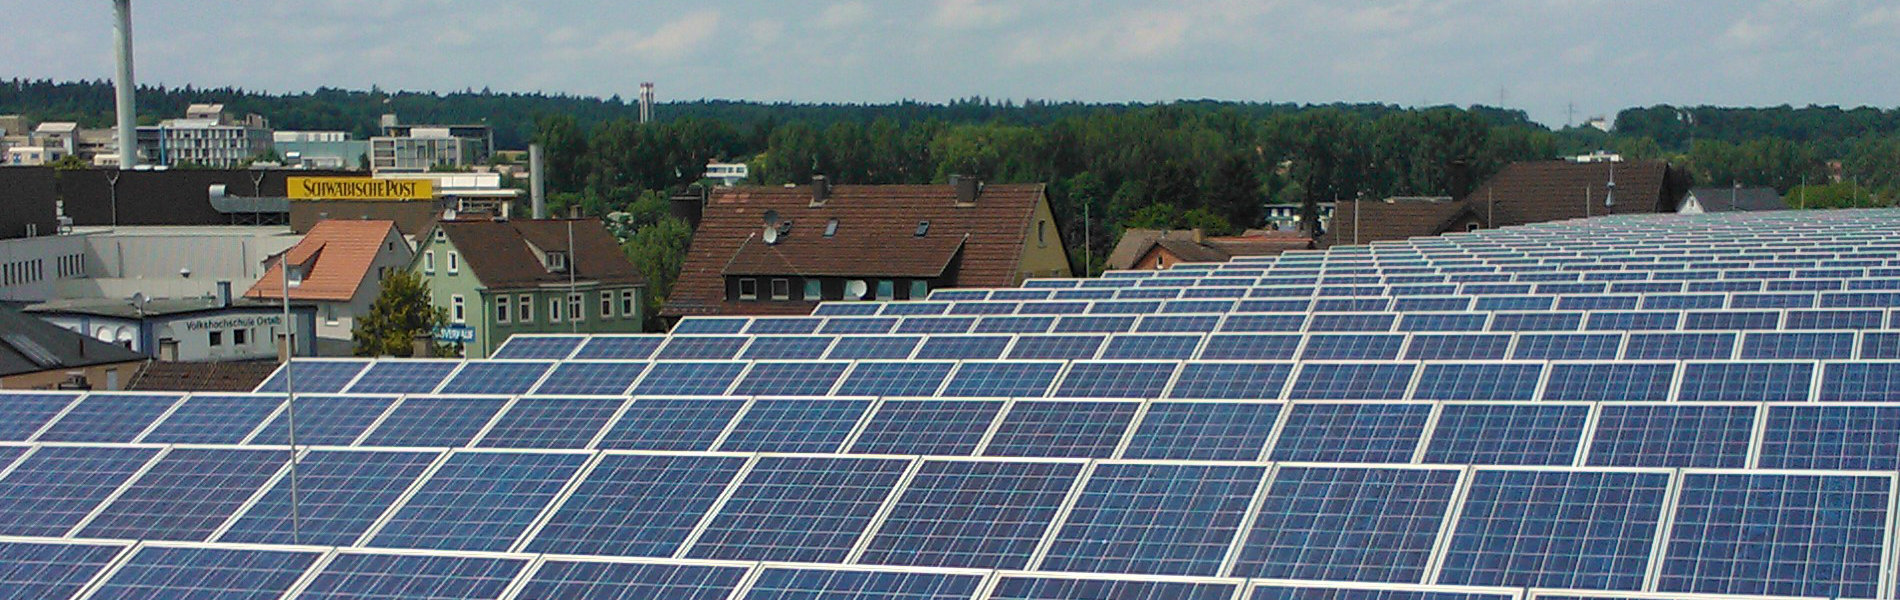 Parkhaus - Aufgeständerte Photovoltaikanlage